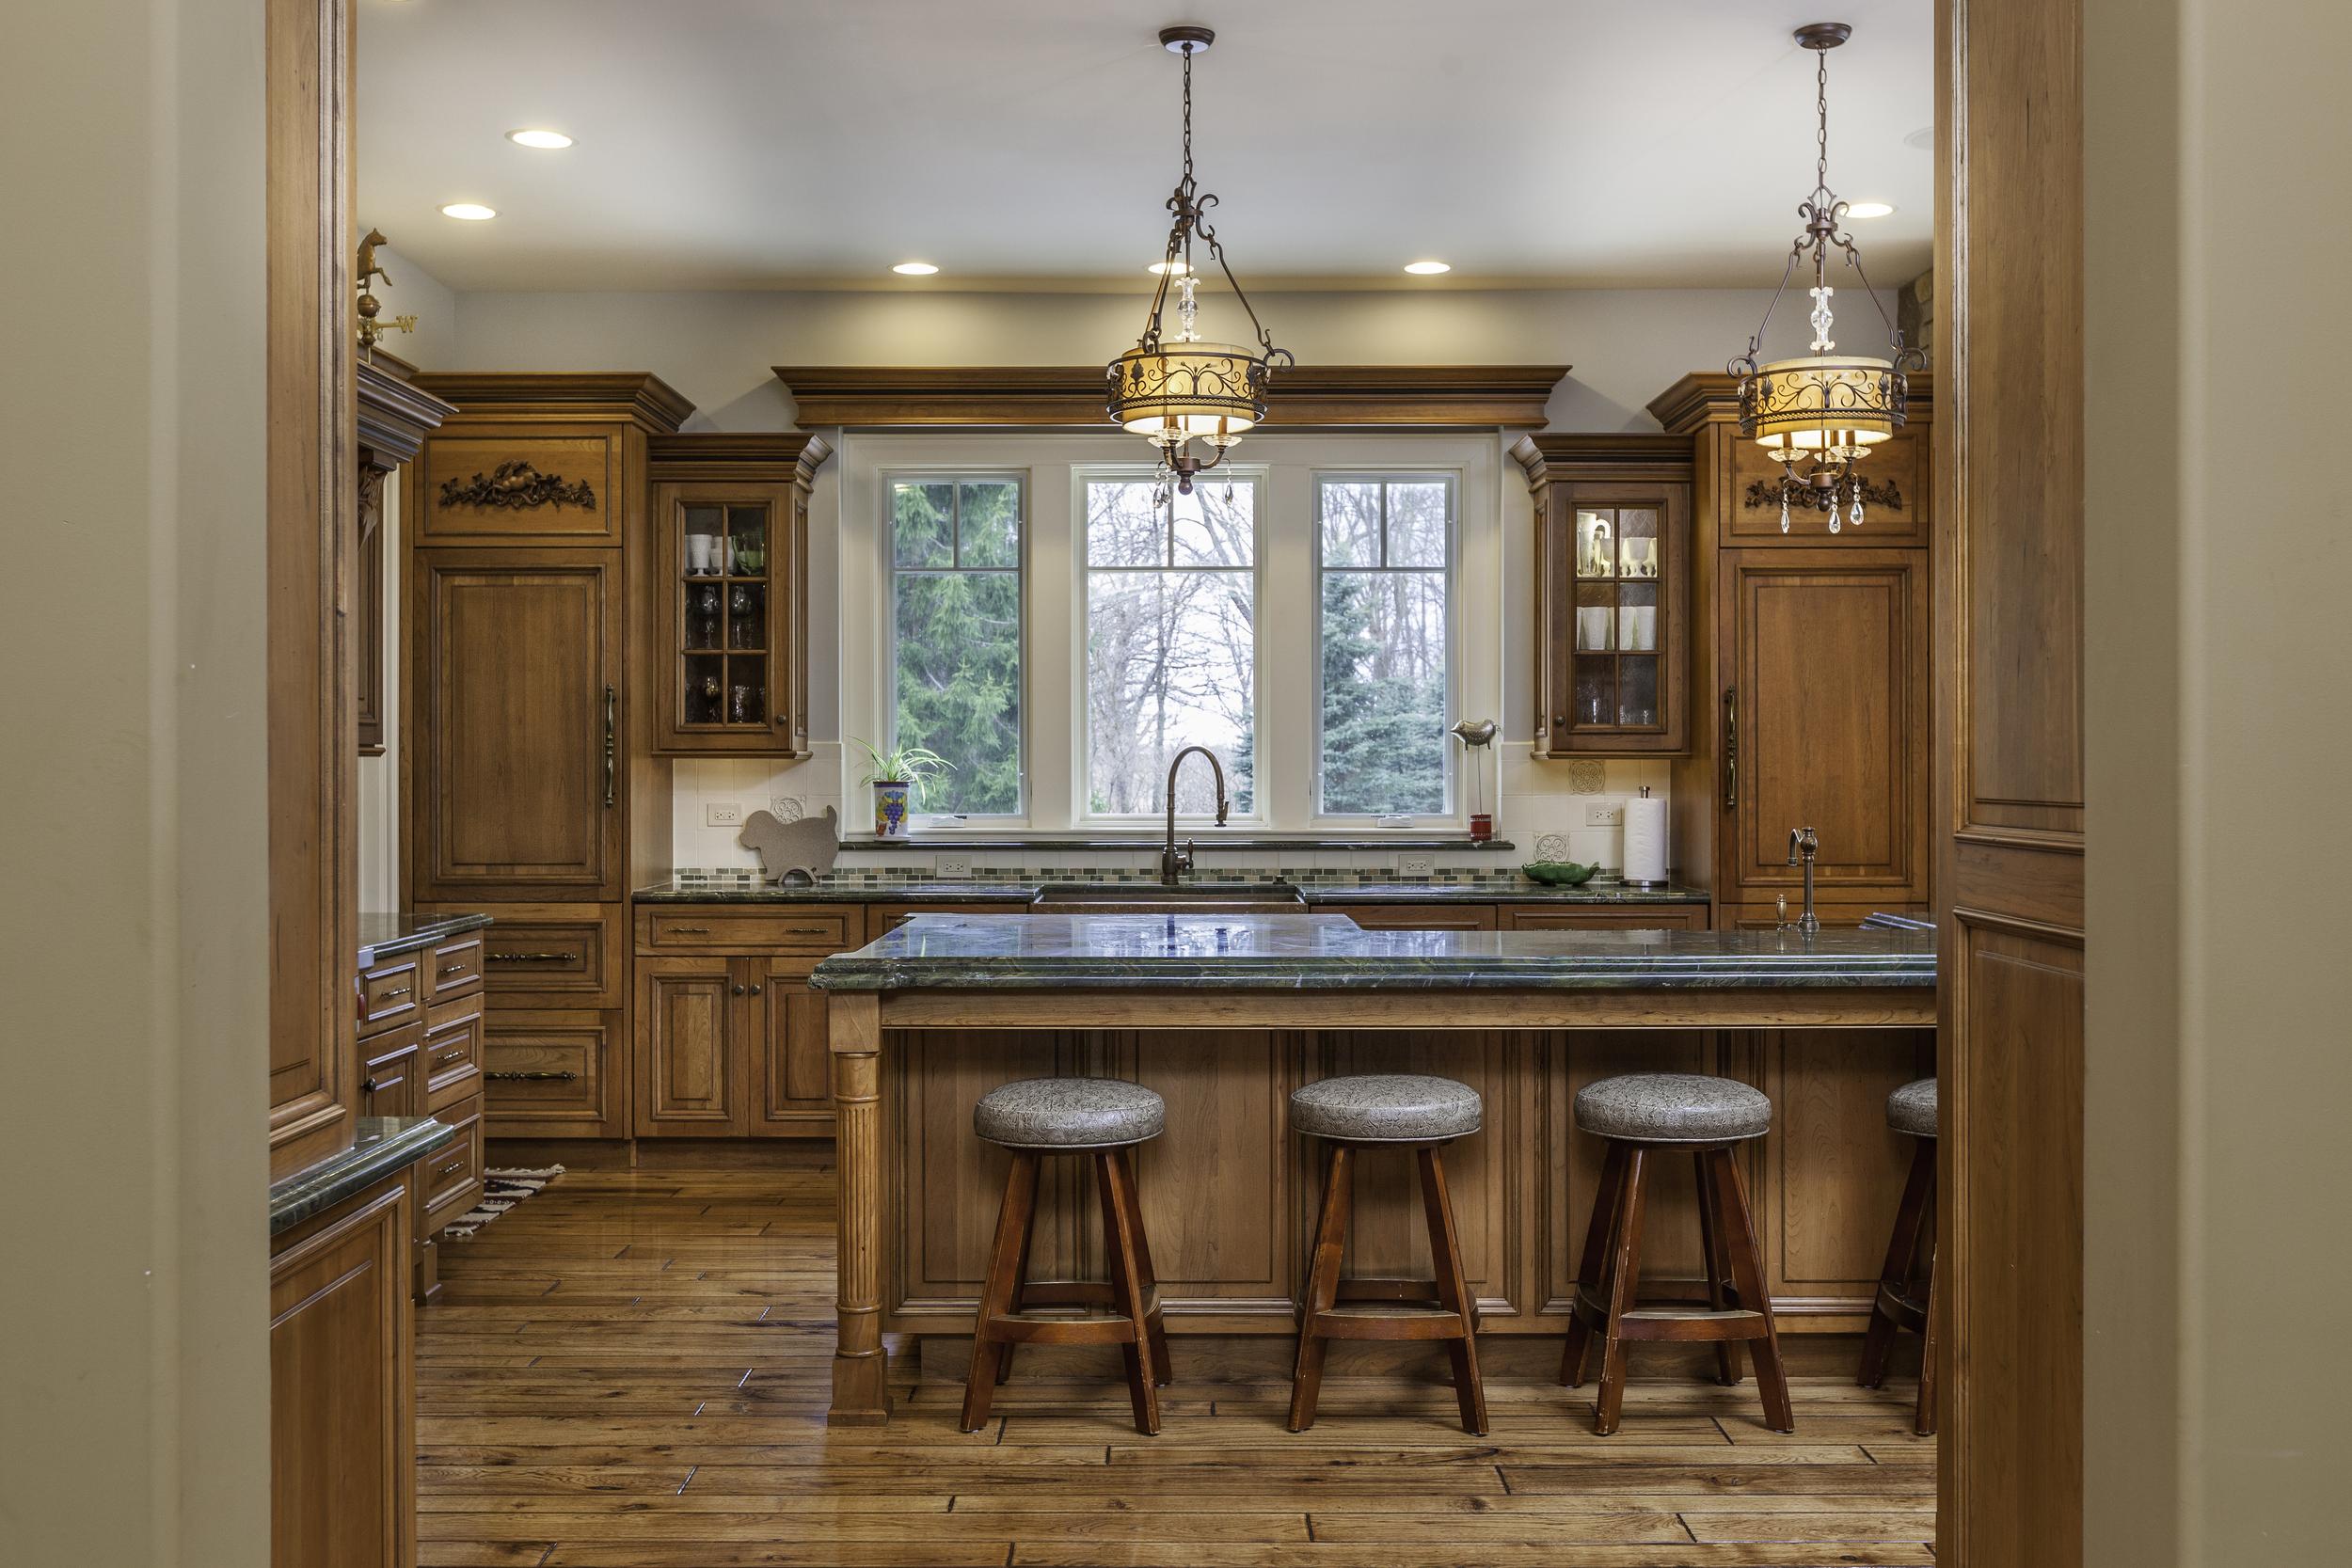 Trevor_muellner_kitchen3.jpg